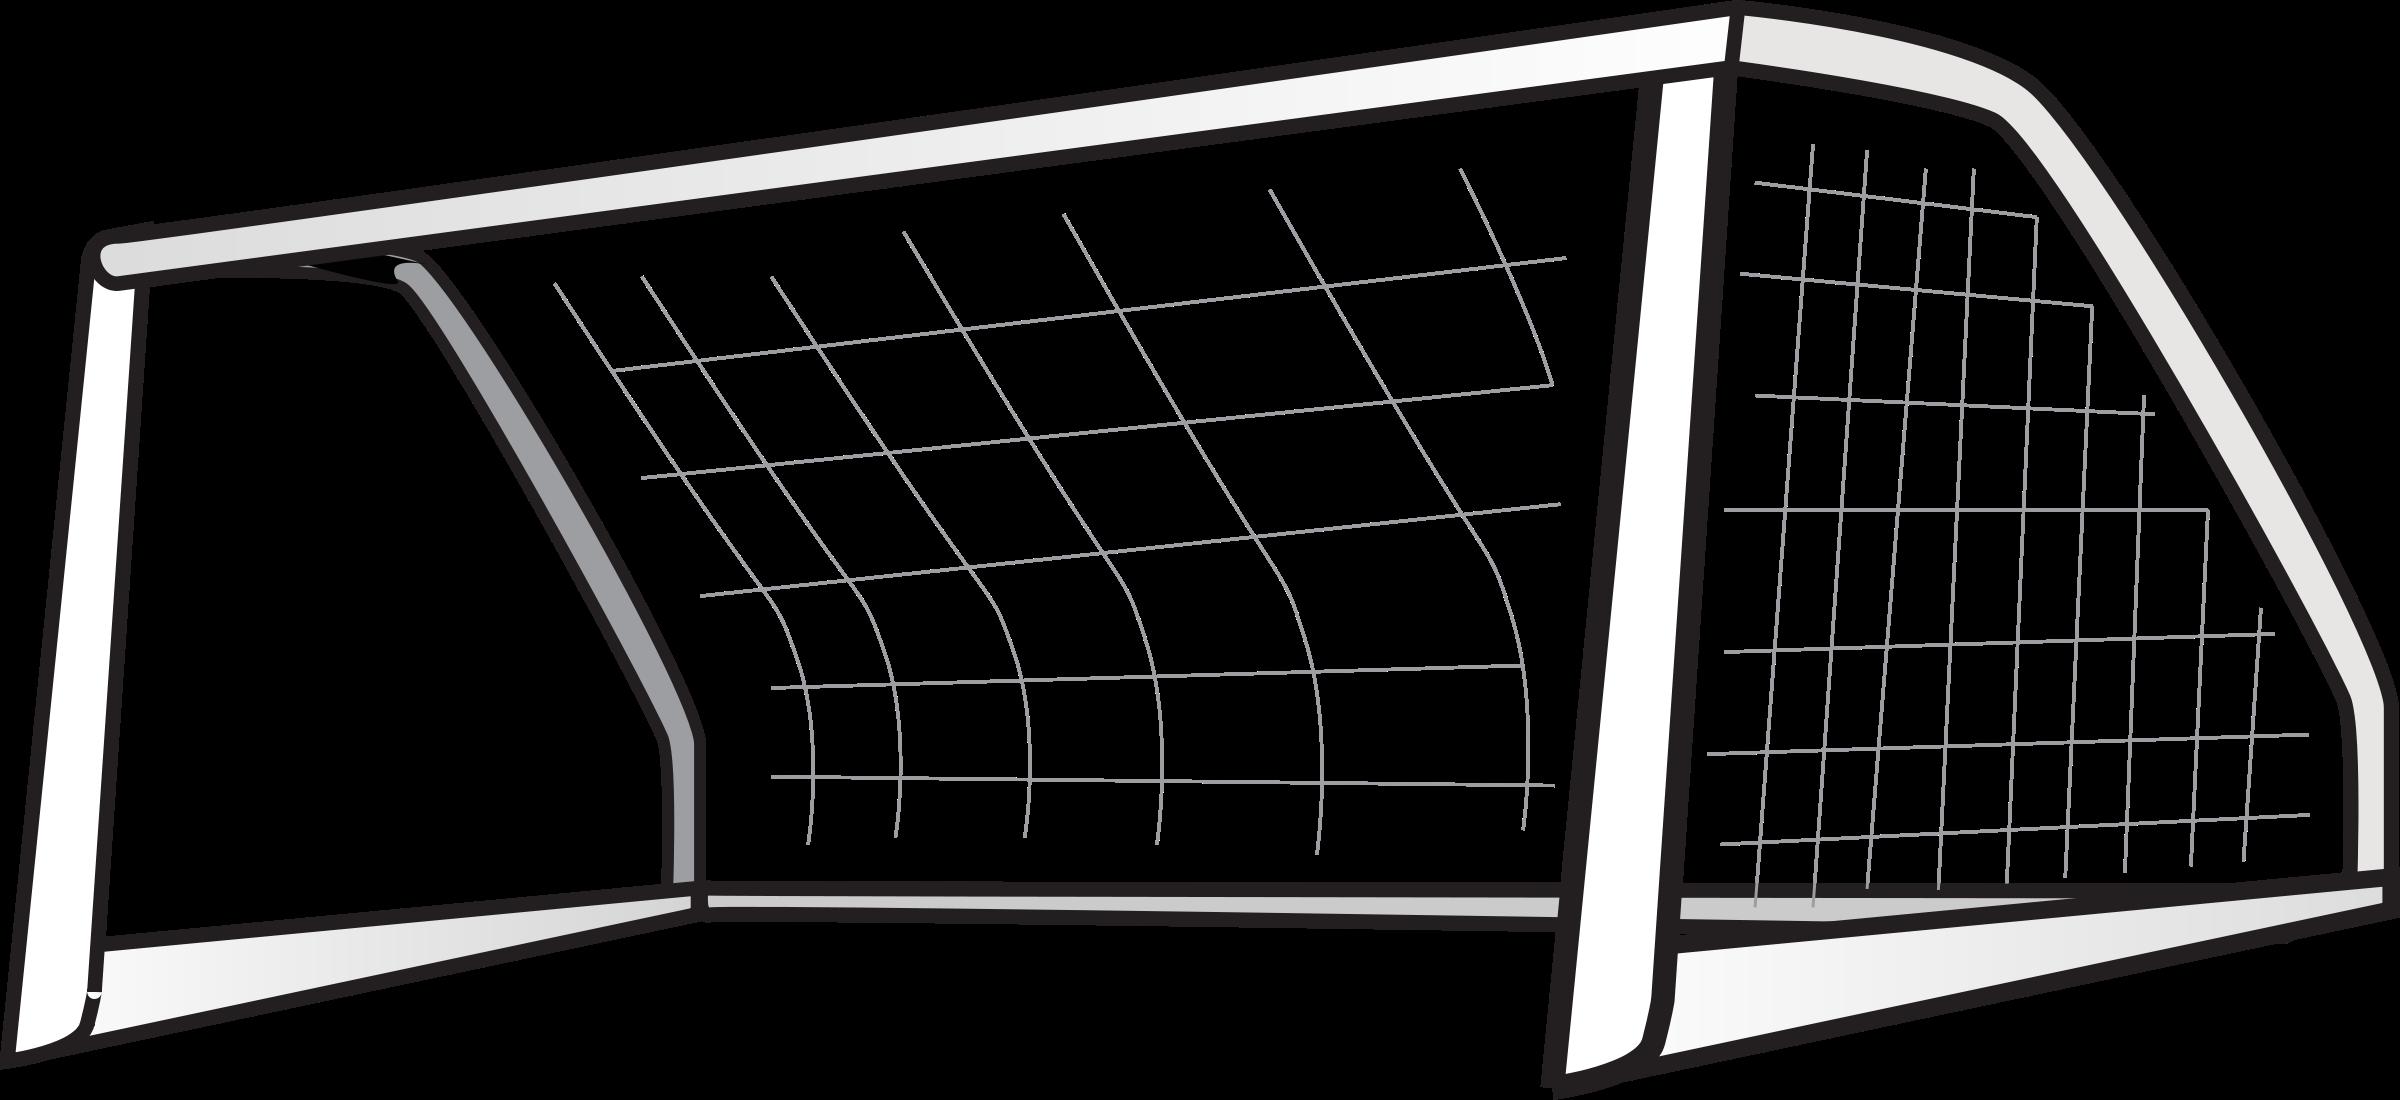 Goal post football clipart image transparent stock Soccer Goal Clipart & Soccer Goal Clip Art Images - ClipartALL.com image transparent stock